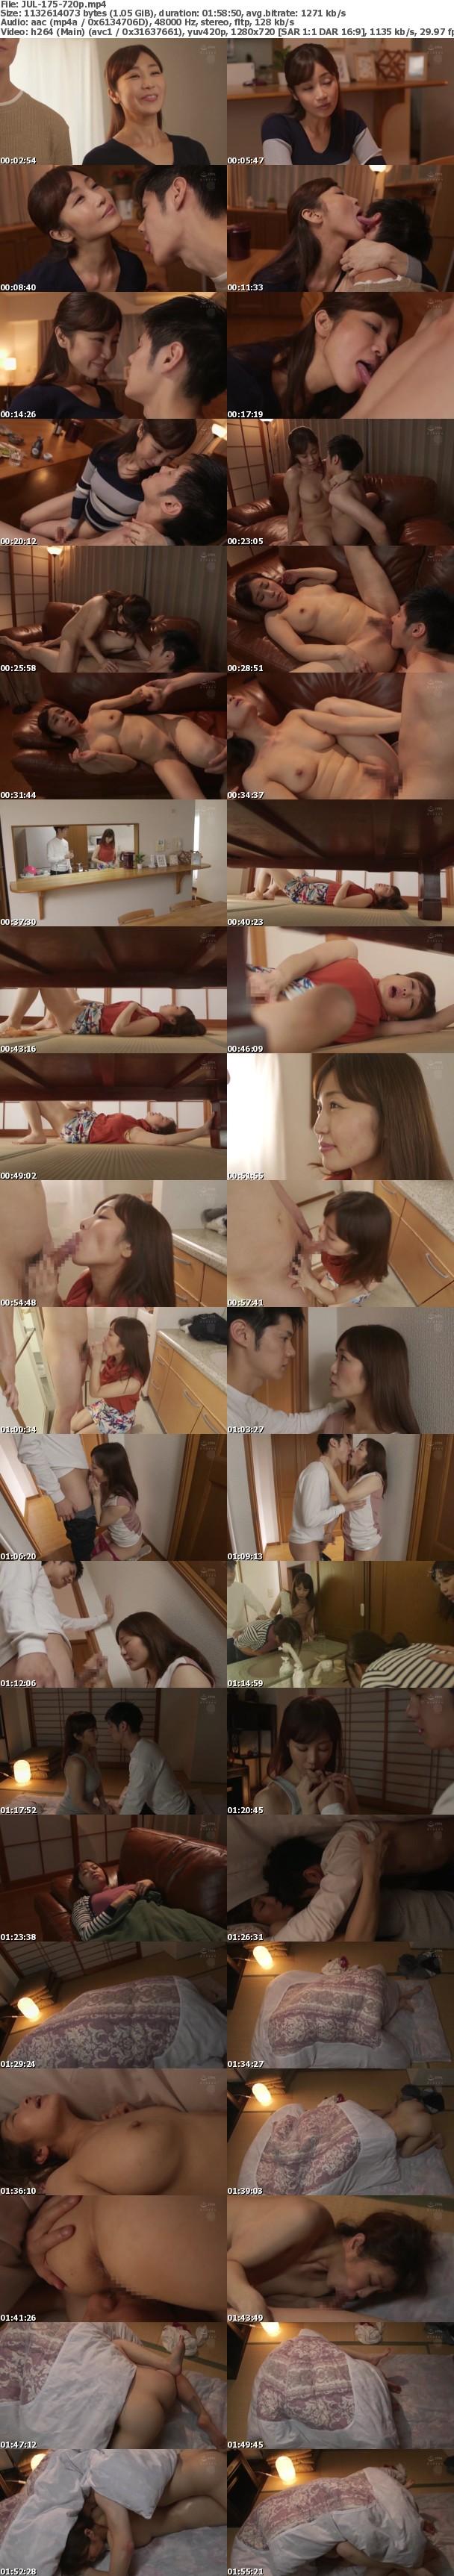 (HD) JUL-175 性欲旺盛な娘婿を密かに寝取る発情義母 ~肉欲を貪り合う背徳中出し性交~ 大島優香